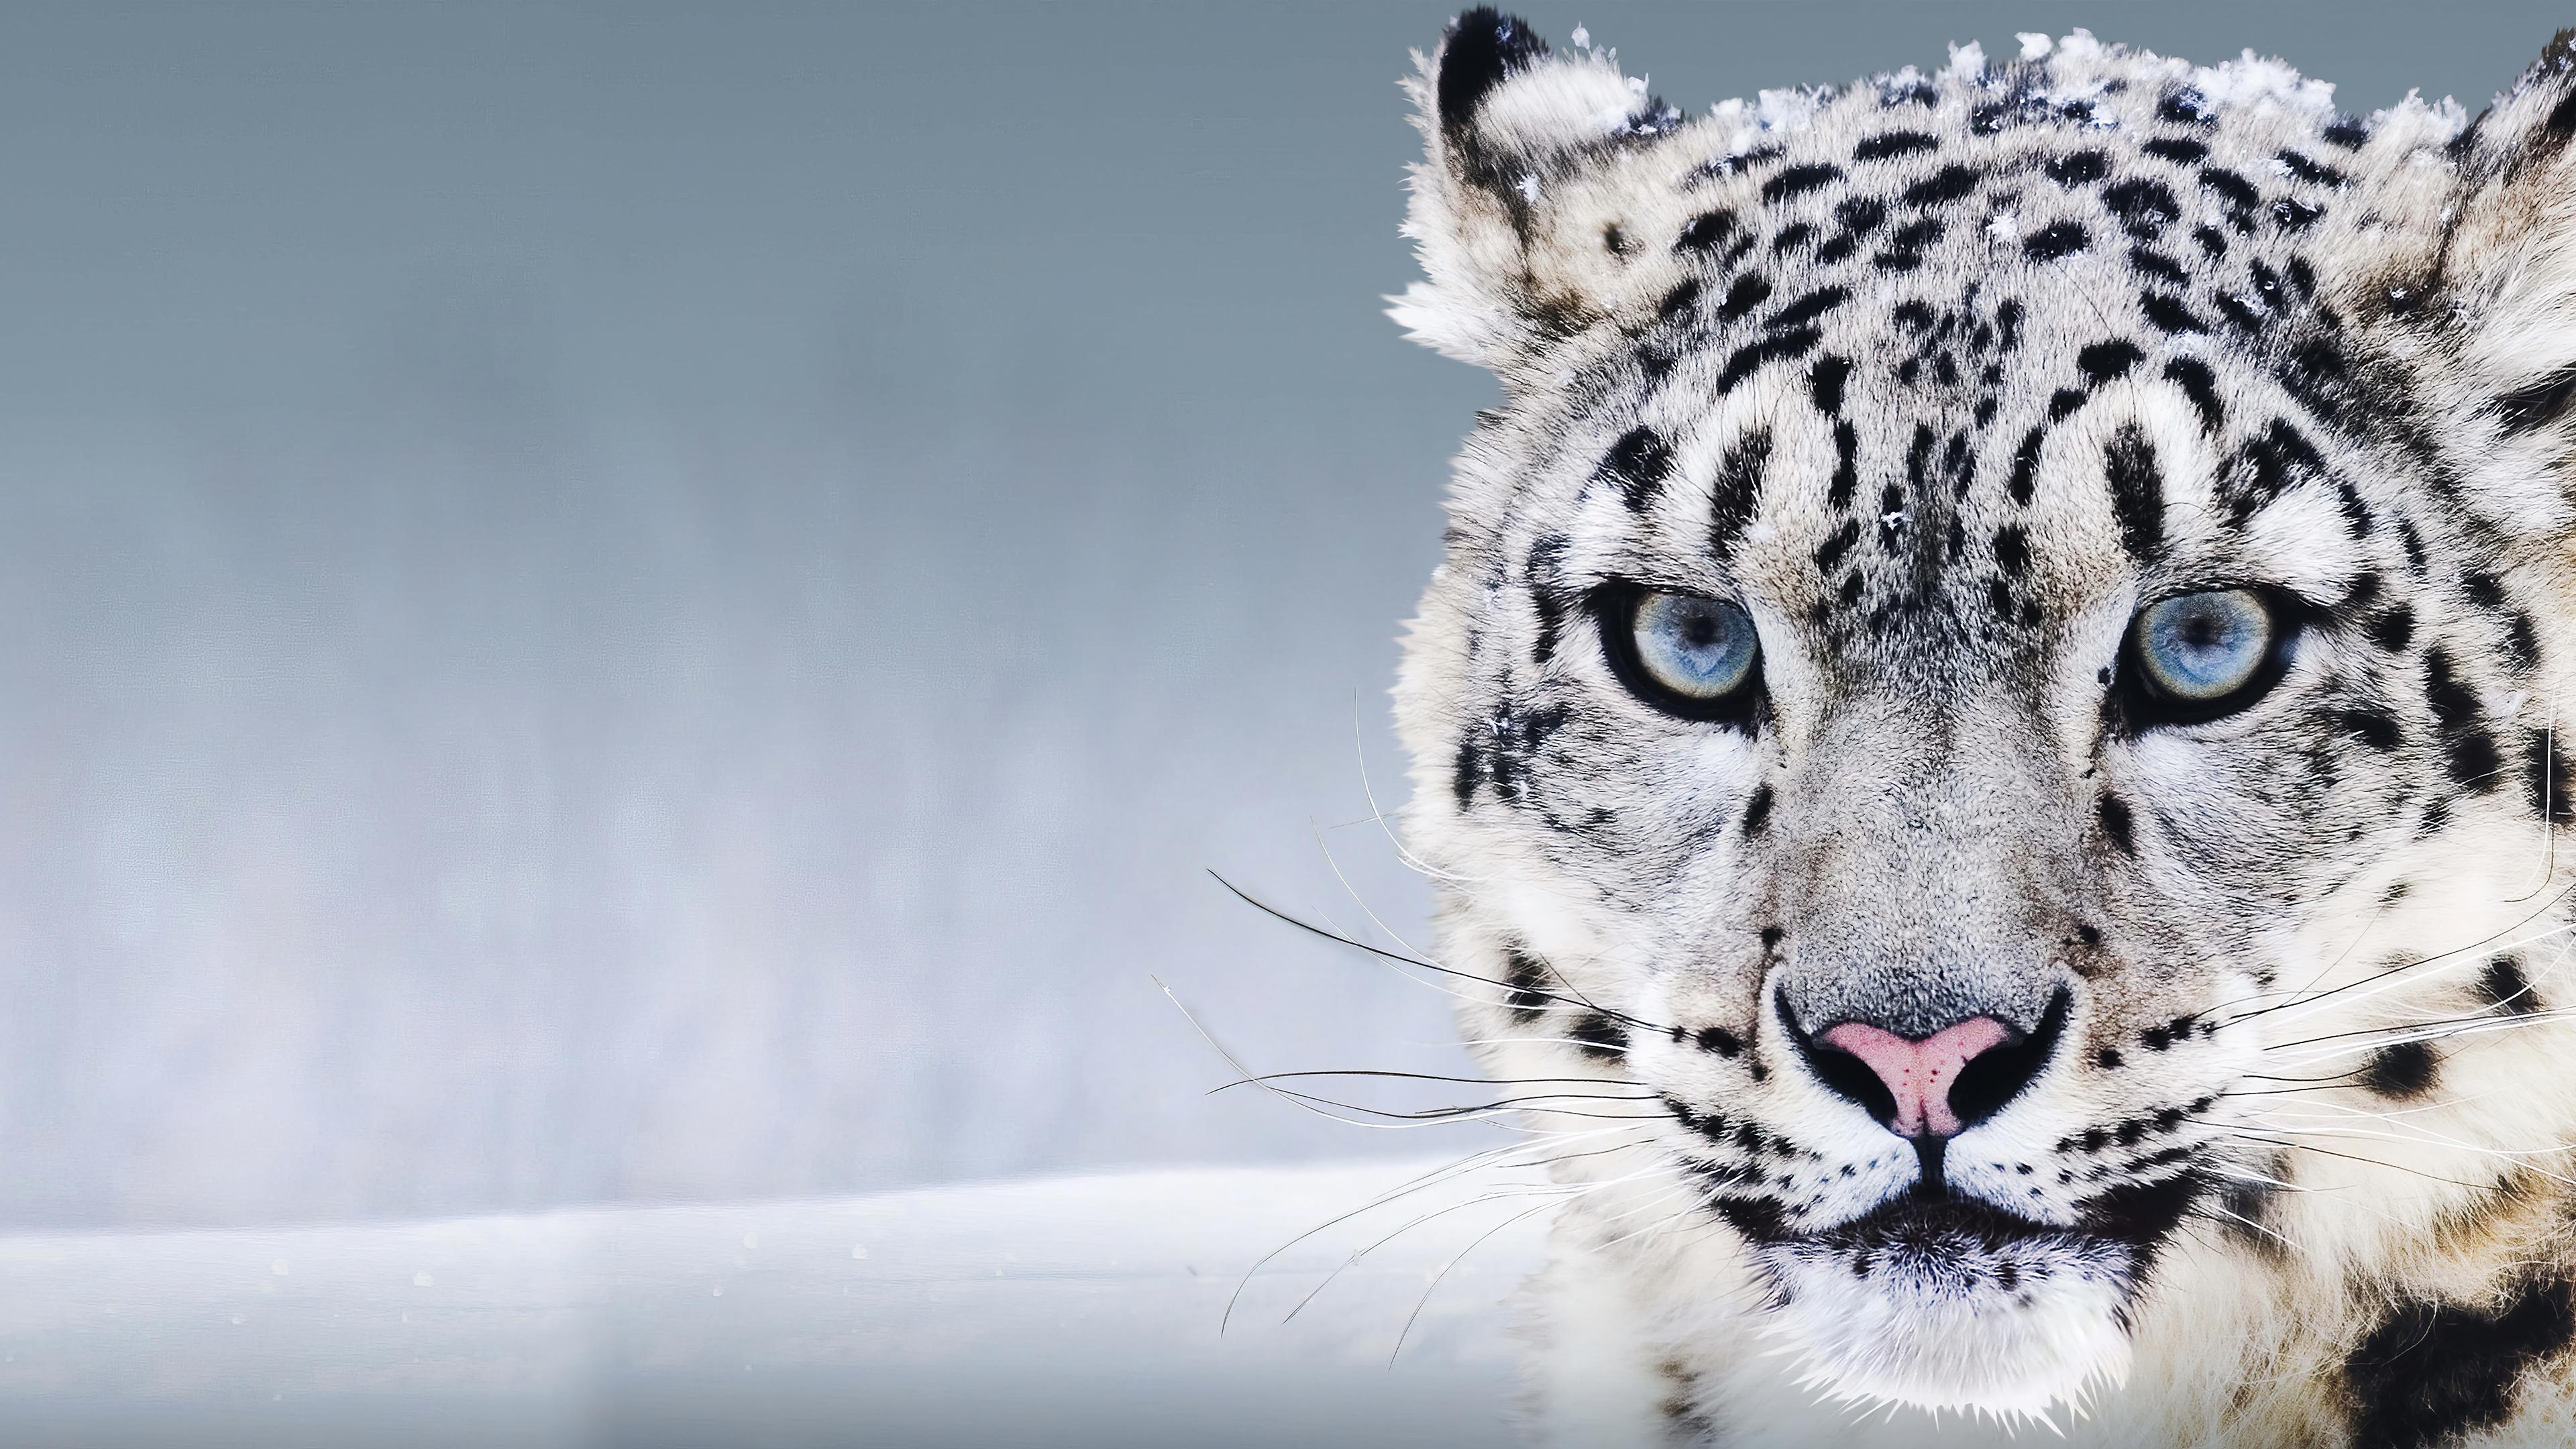 Fondos de pantalla Leopardo blanco en la nieve